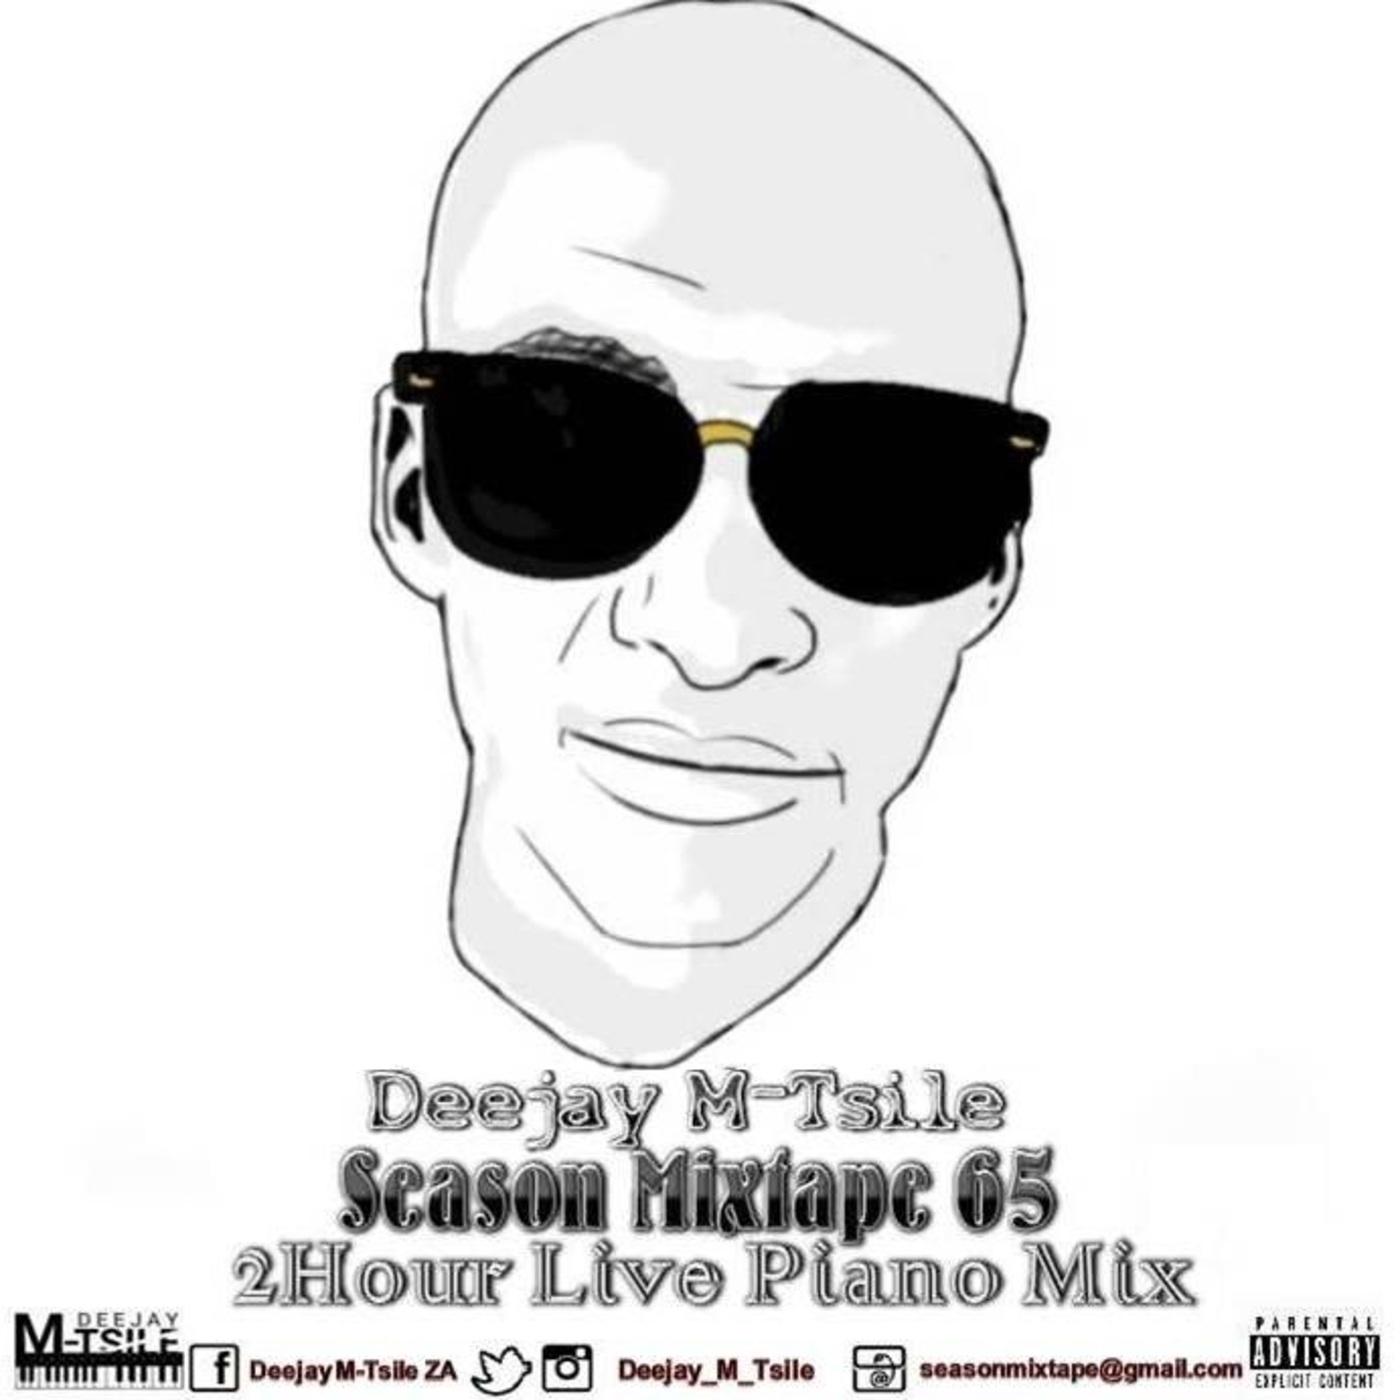 Deejay M-Tsile's Season Mixtape Podcast | Listen Free on